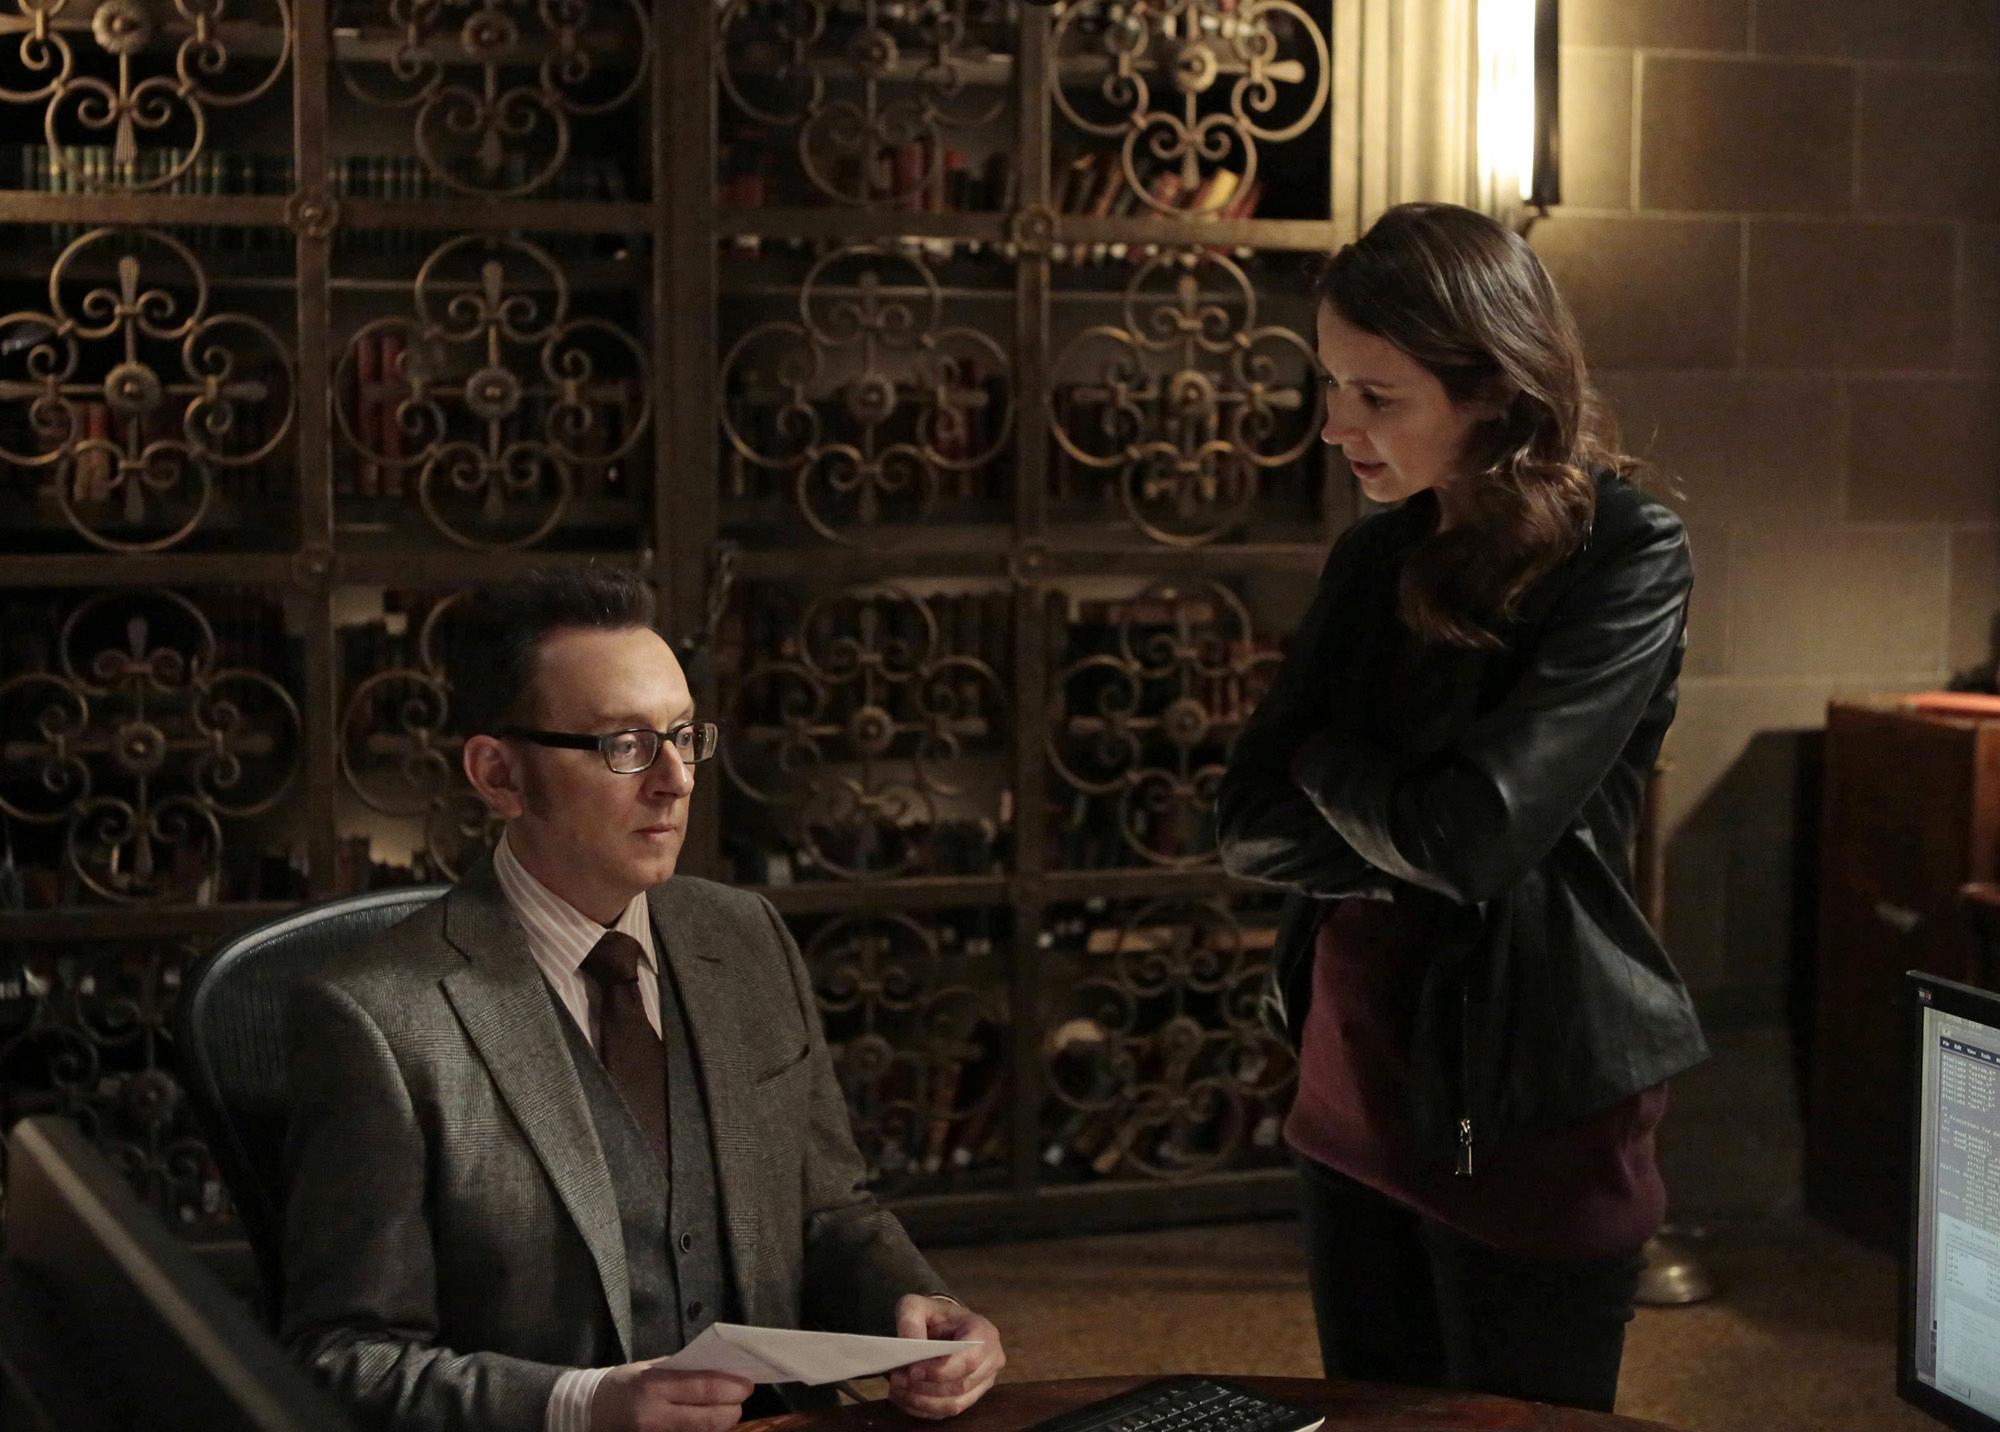 Season 3 Episode 17 - Person of Interest - CBS.com